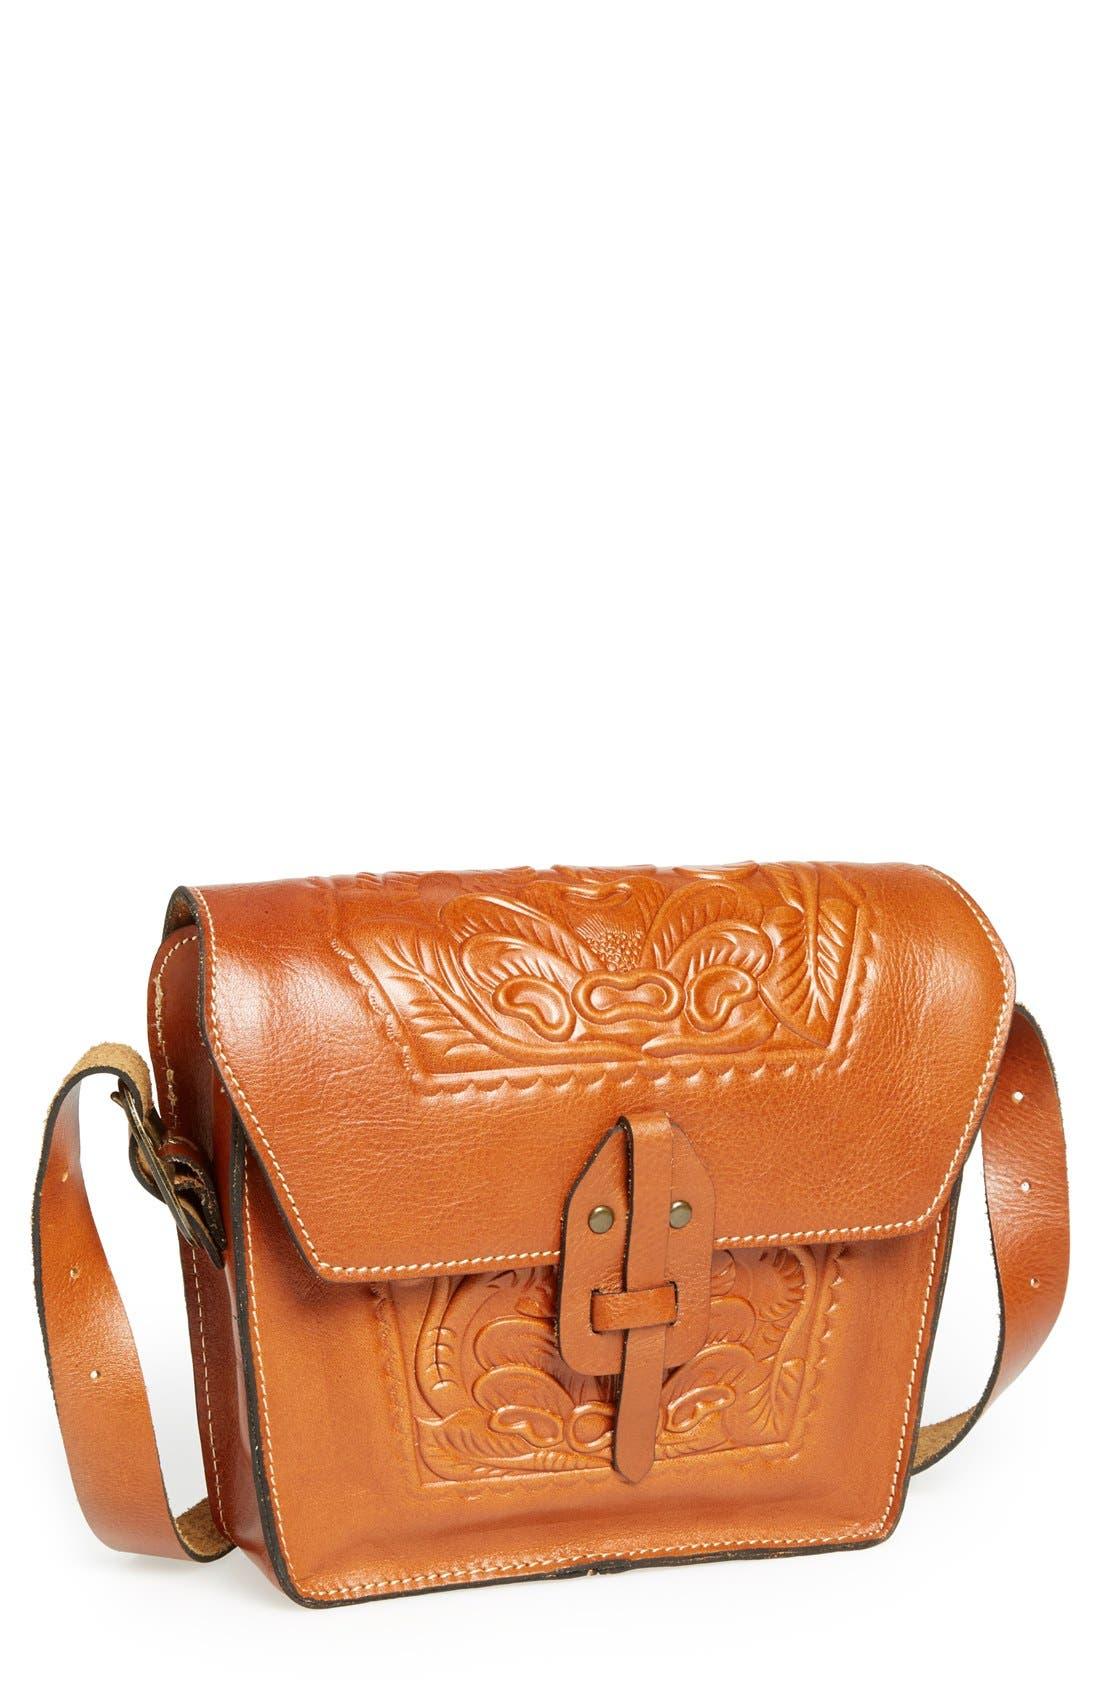 Main Image - Patricia Nash 'Marciana' Shoulder Bag